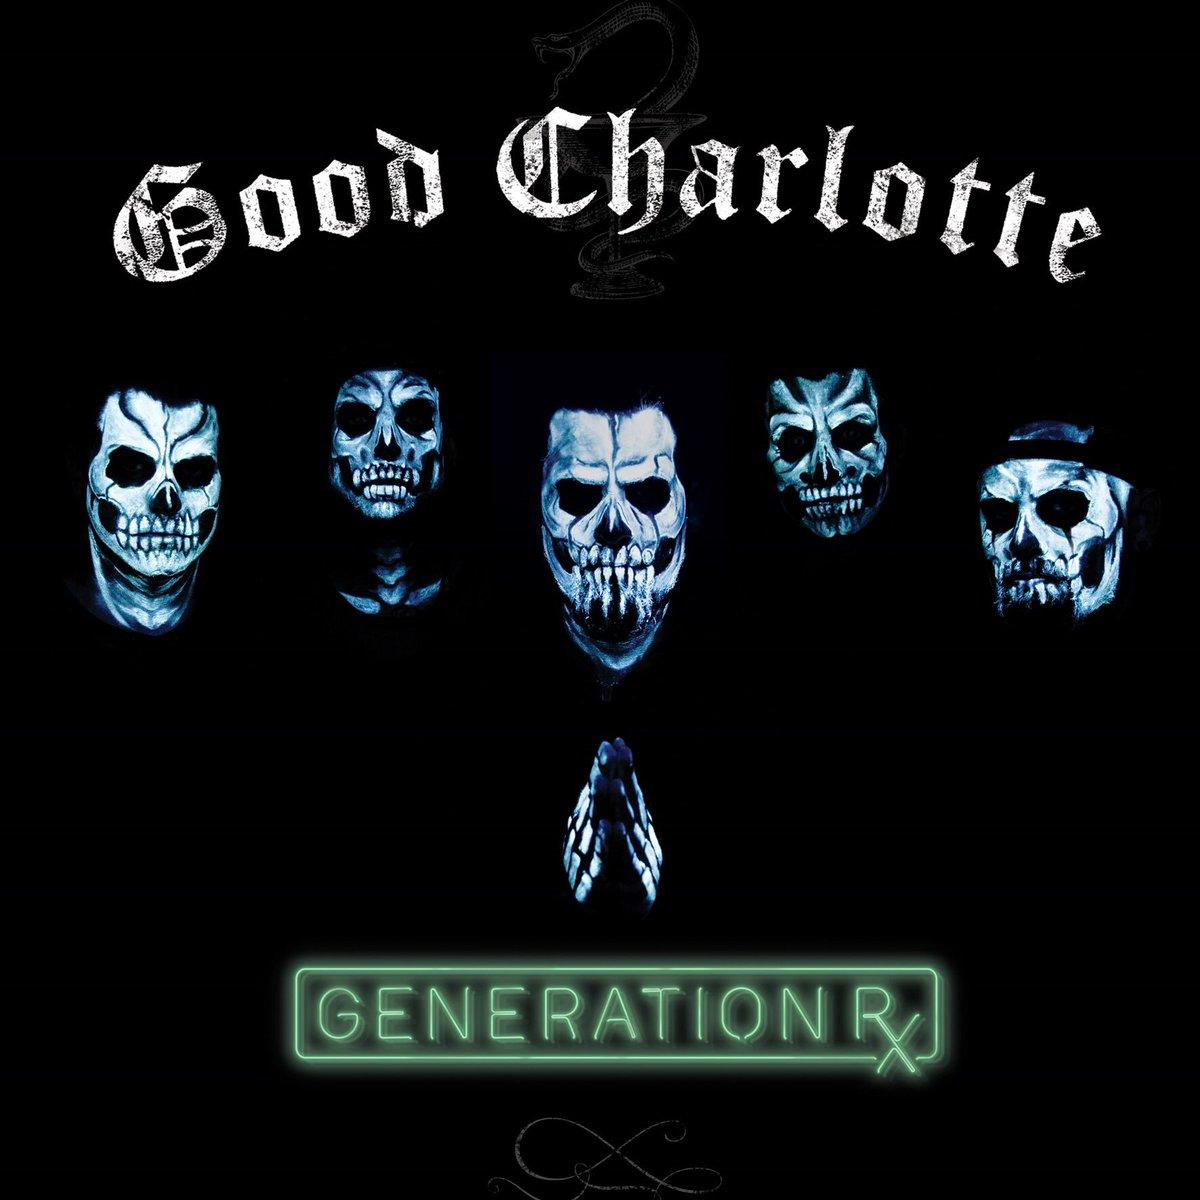 RT @GoodCharlotte: listen to GENERATION Rx on @AppleMusic NOW! https://t.co/vJ3JrRminc https://t.co/rBtFDH16ZI